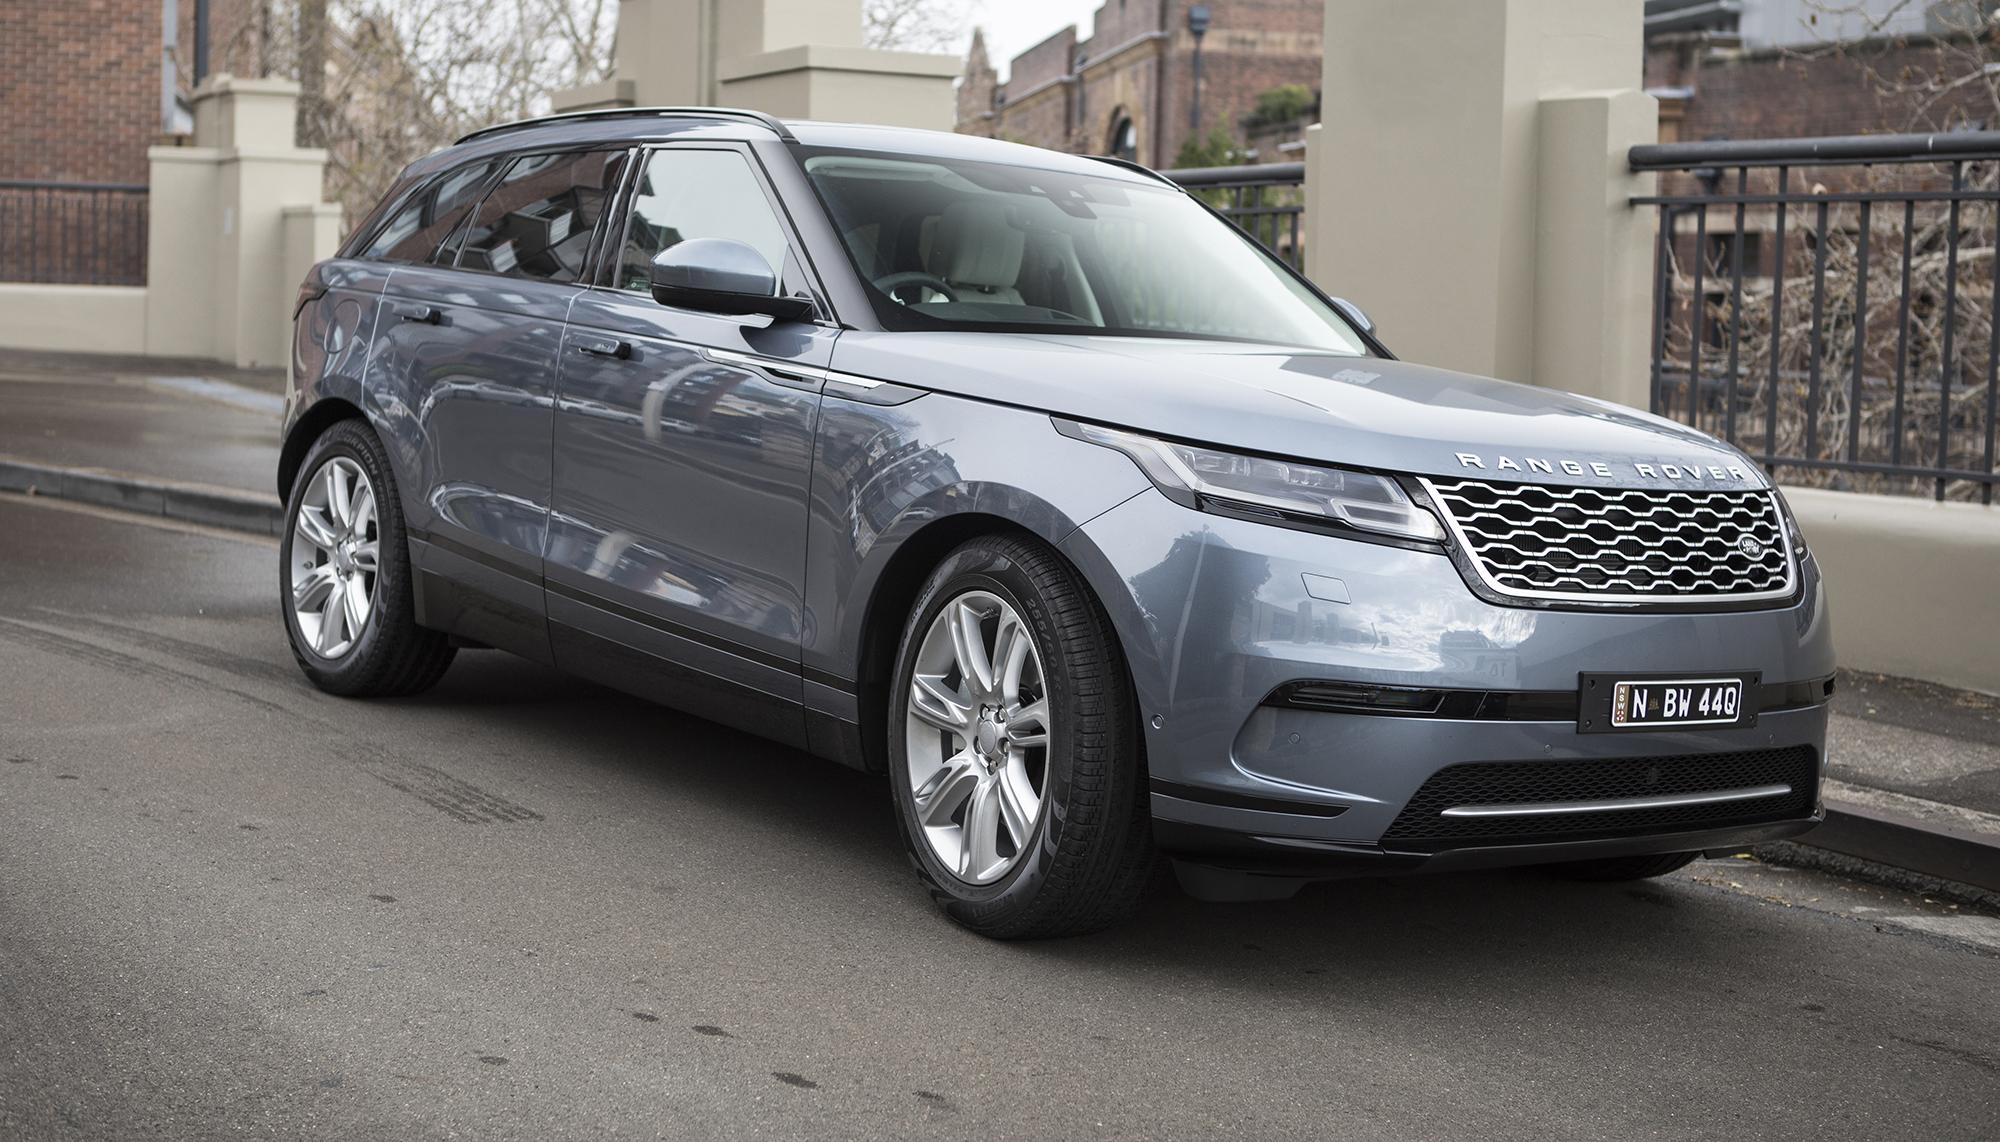 2018 Camry Price >> 2018 Range Rover Velar SE D240 diesel review | CarAdvice